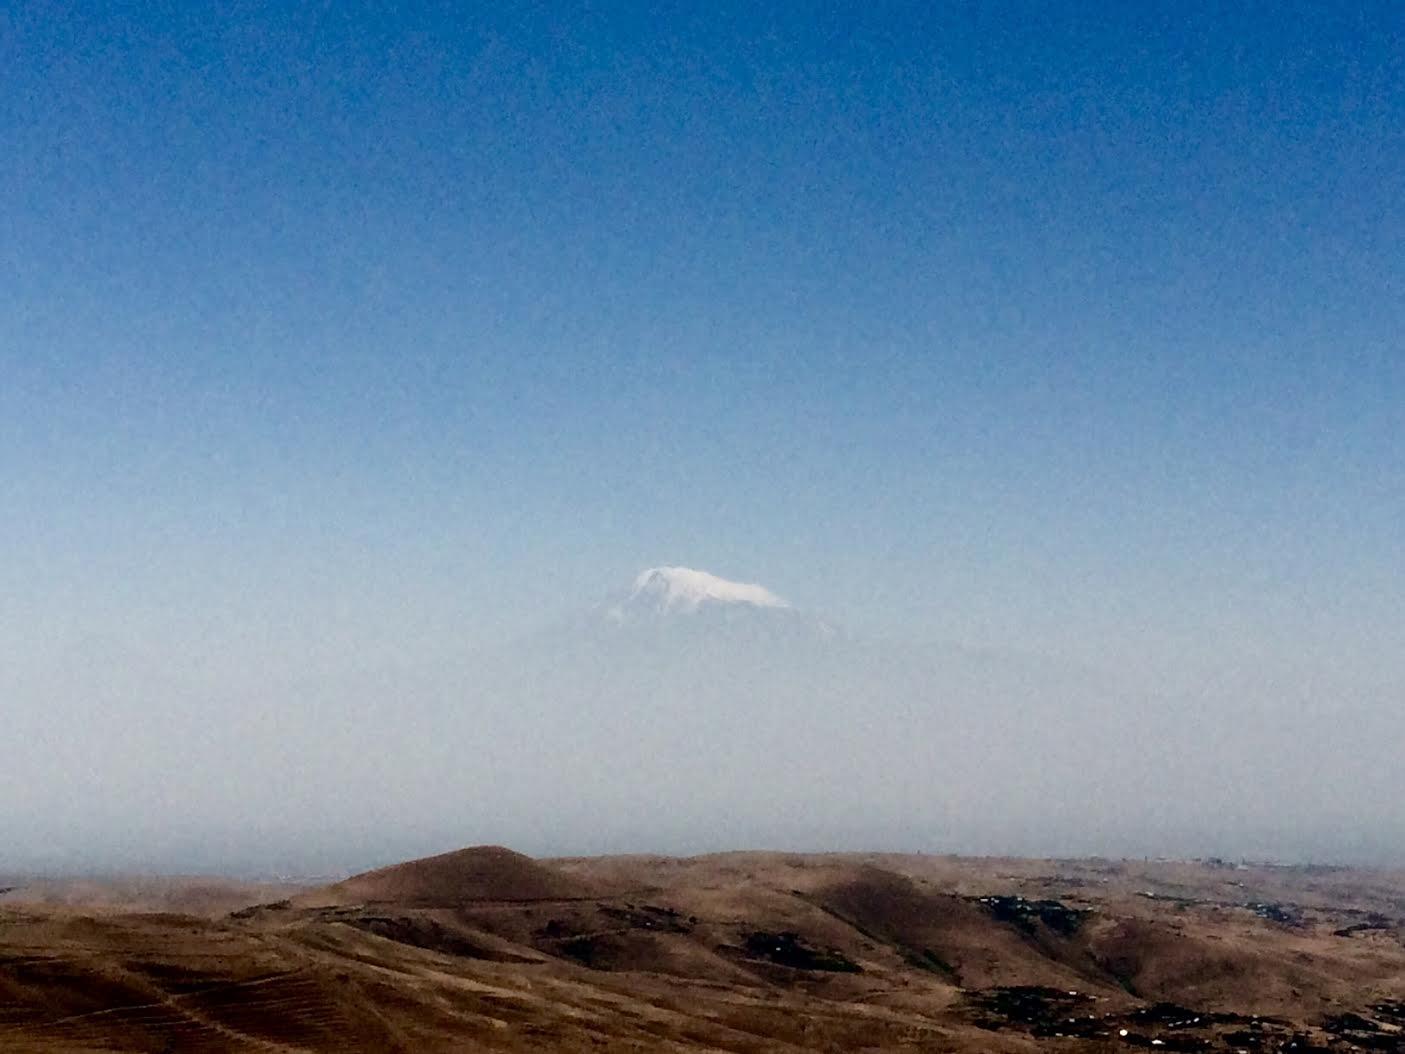 A rare peek at the summit of Mt Ararat. Courtesy of Willhemina Wahlin